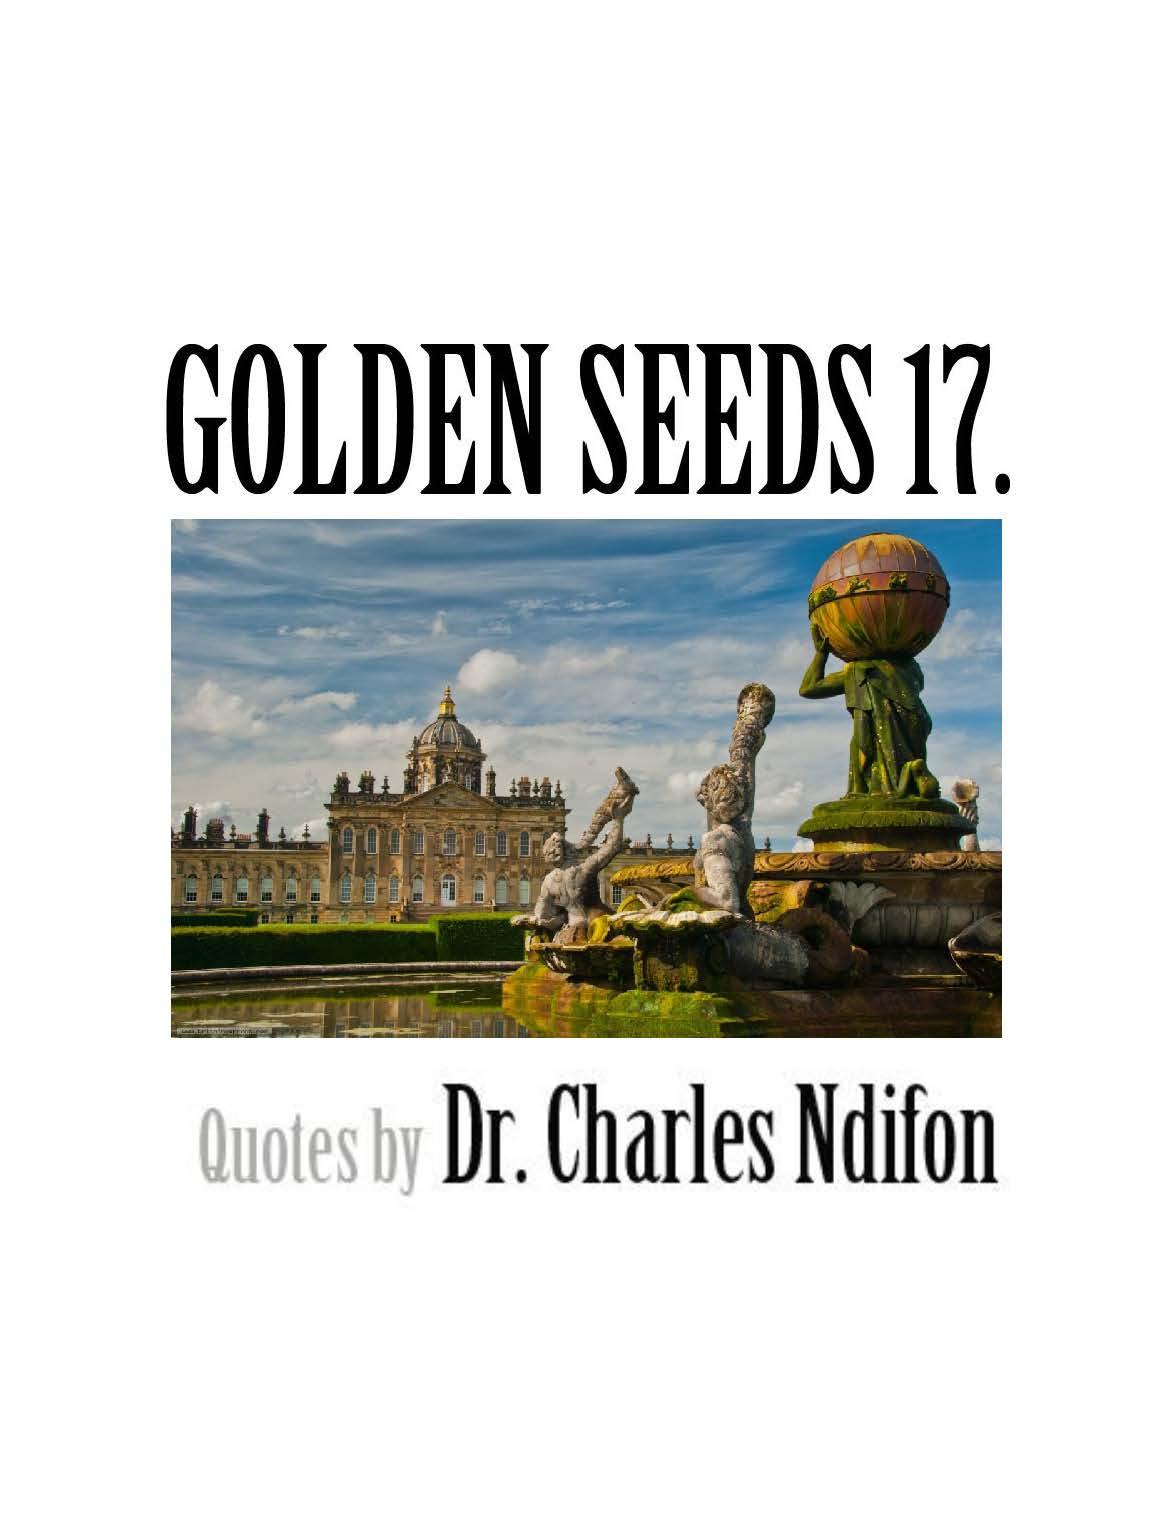 Golden Seeds Series 11-20